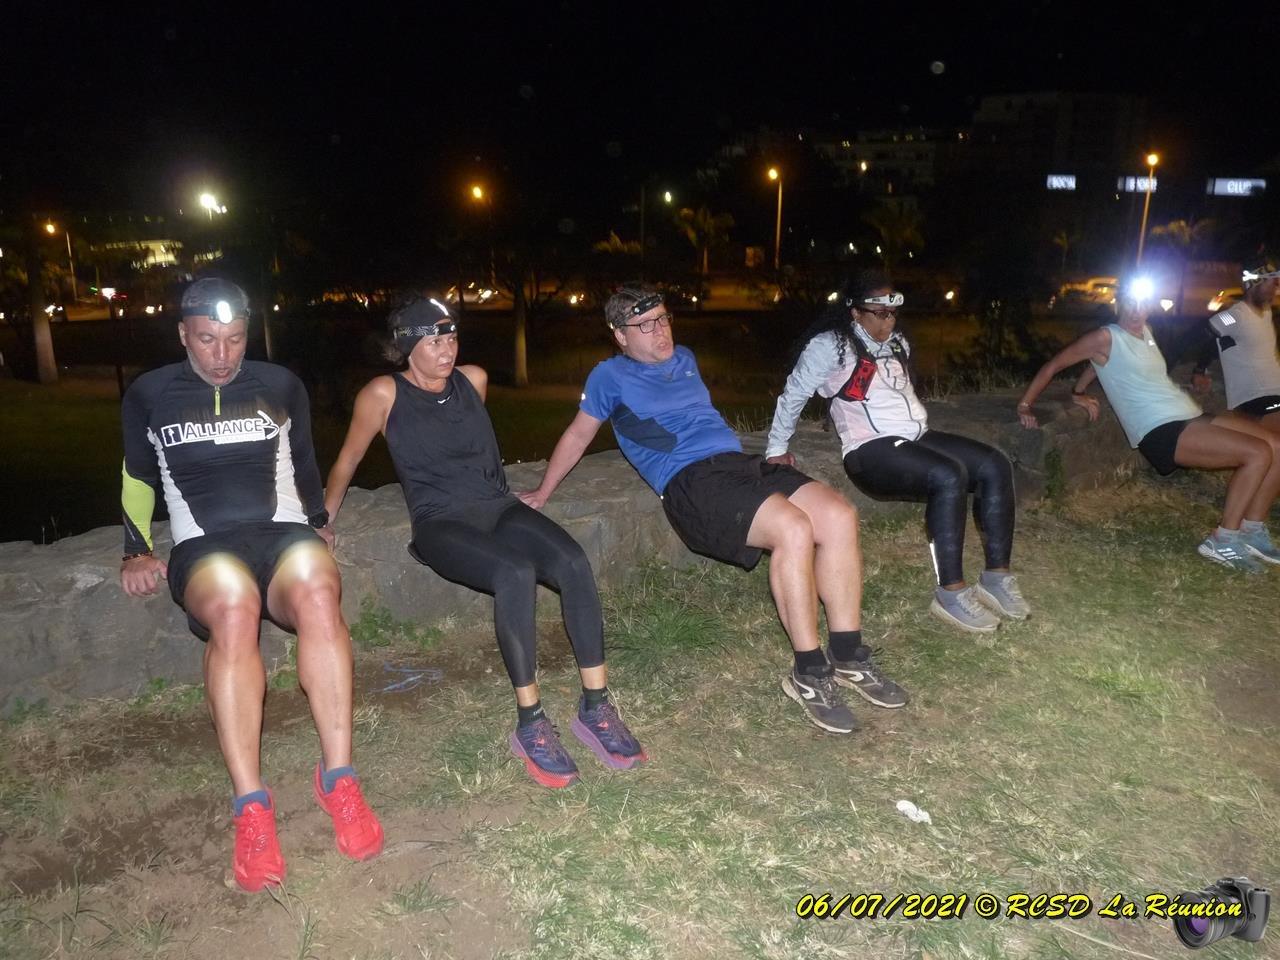 20210706 Entrain Trail Trinité 018